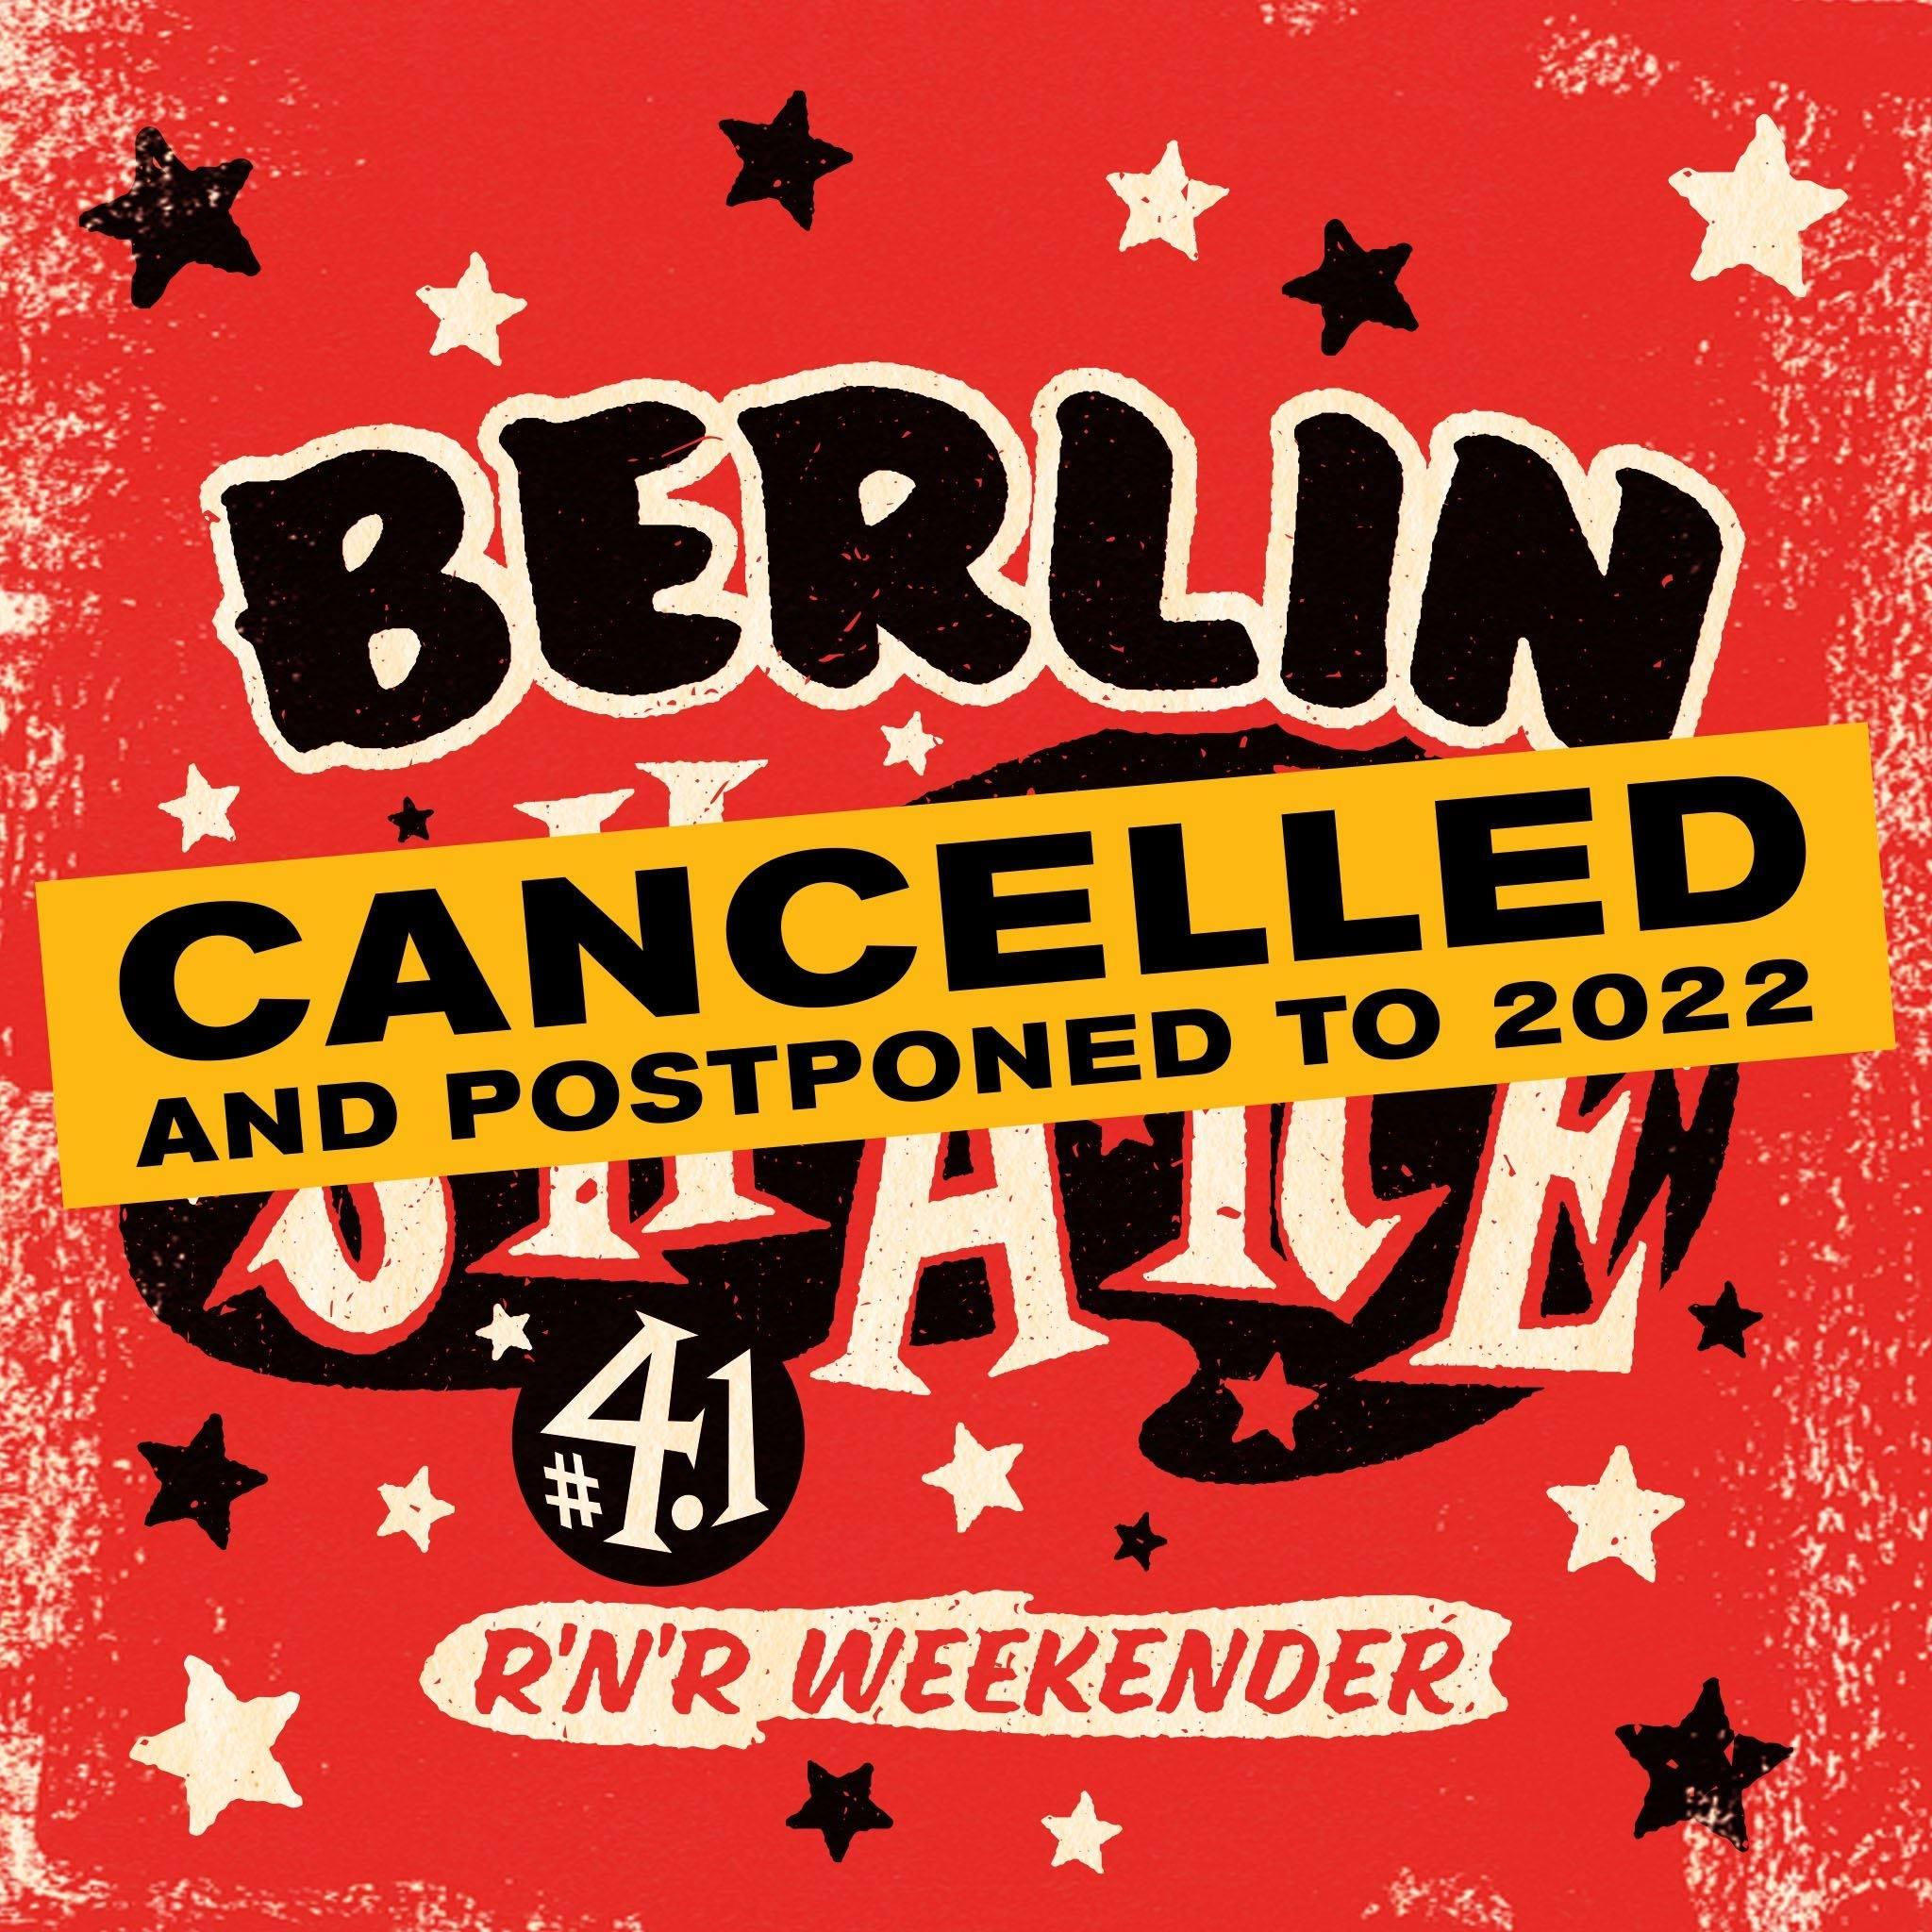 Berlin Shake postponed to 2022